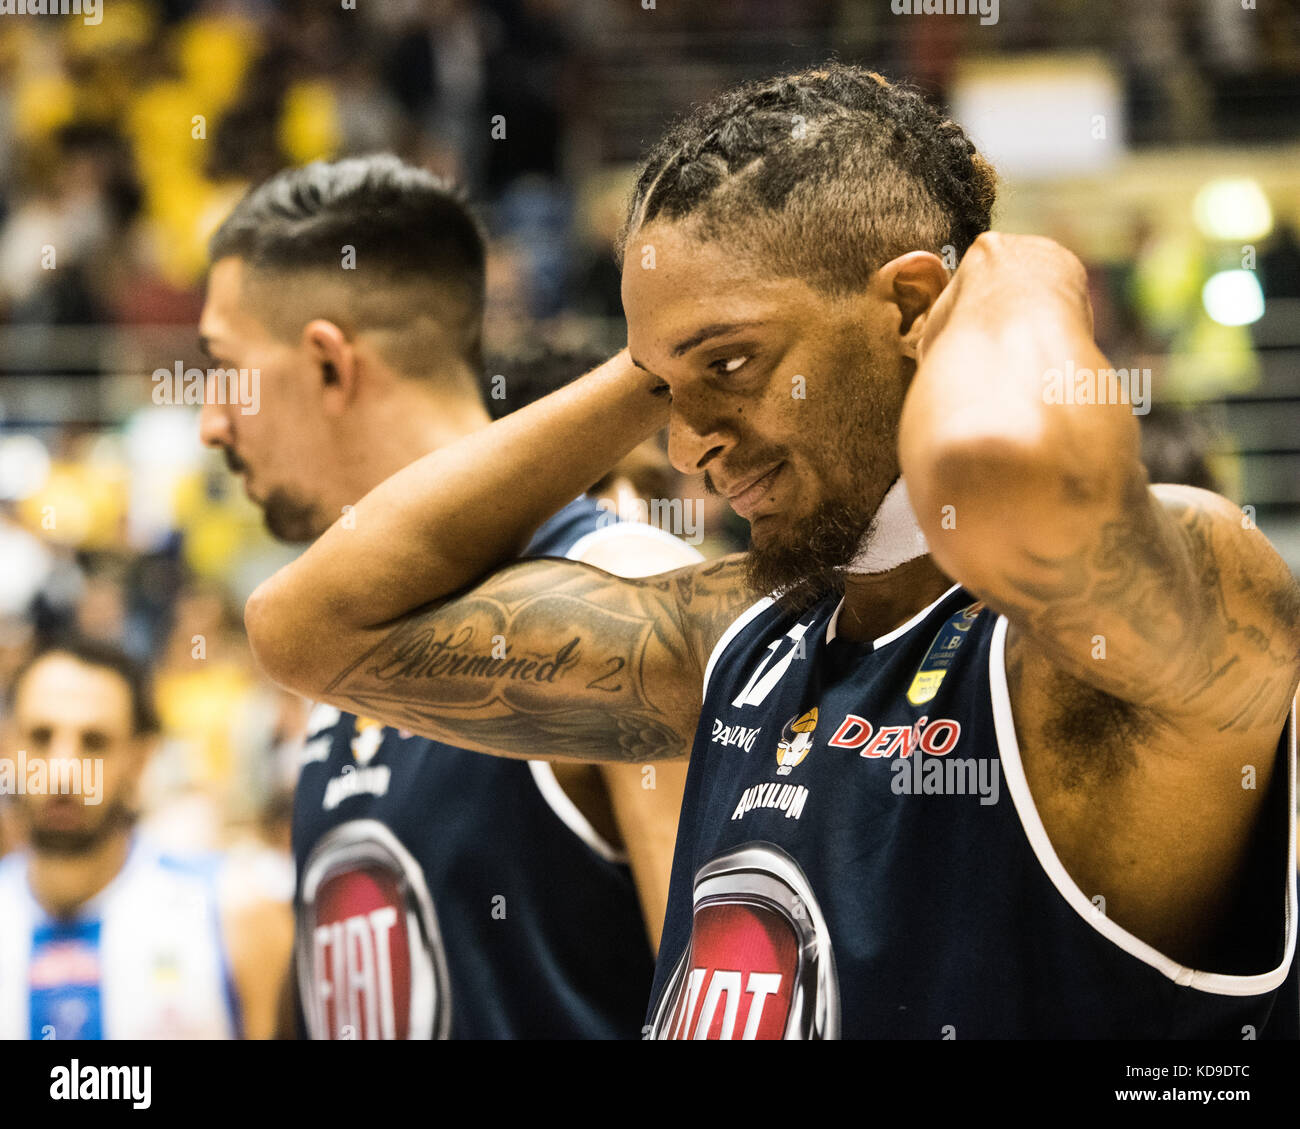 Turin, Italy 7th october 2017. Deron Washington during the Serie A an Basketball match Fiat Torino Auxilium vs Dinamo Stock Photo